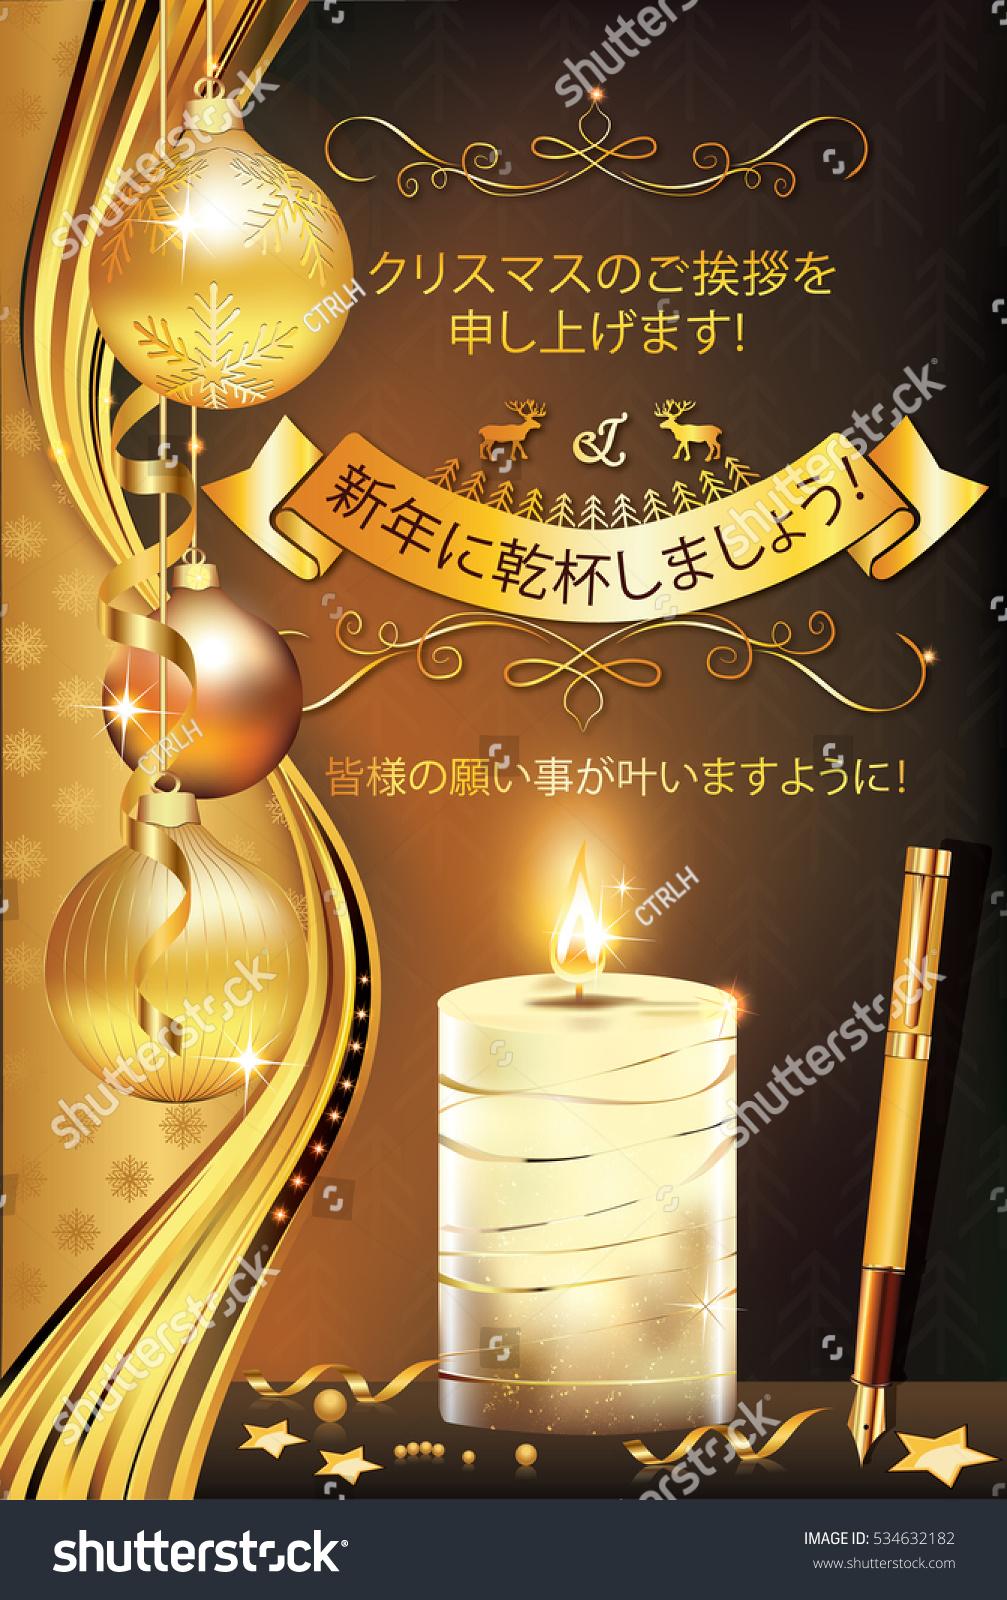 Greeting Card Winter Holiday Japanese Language Stock Illustration